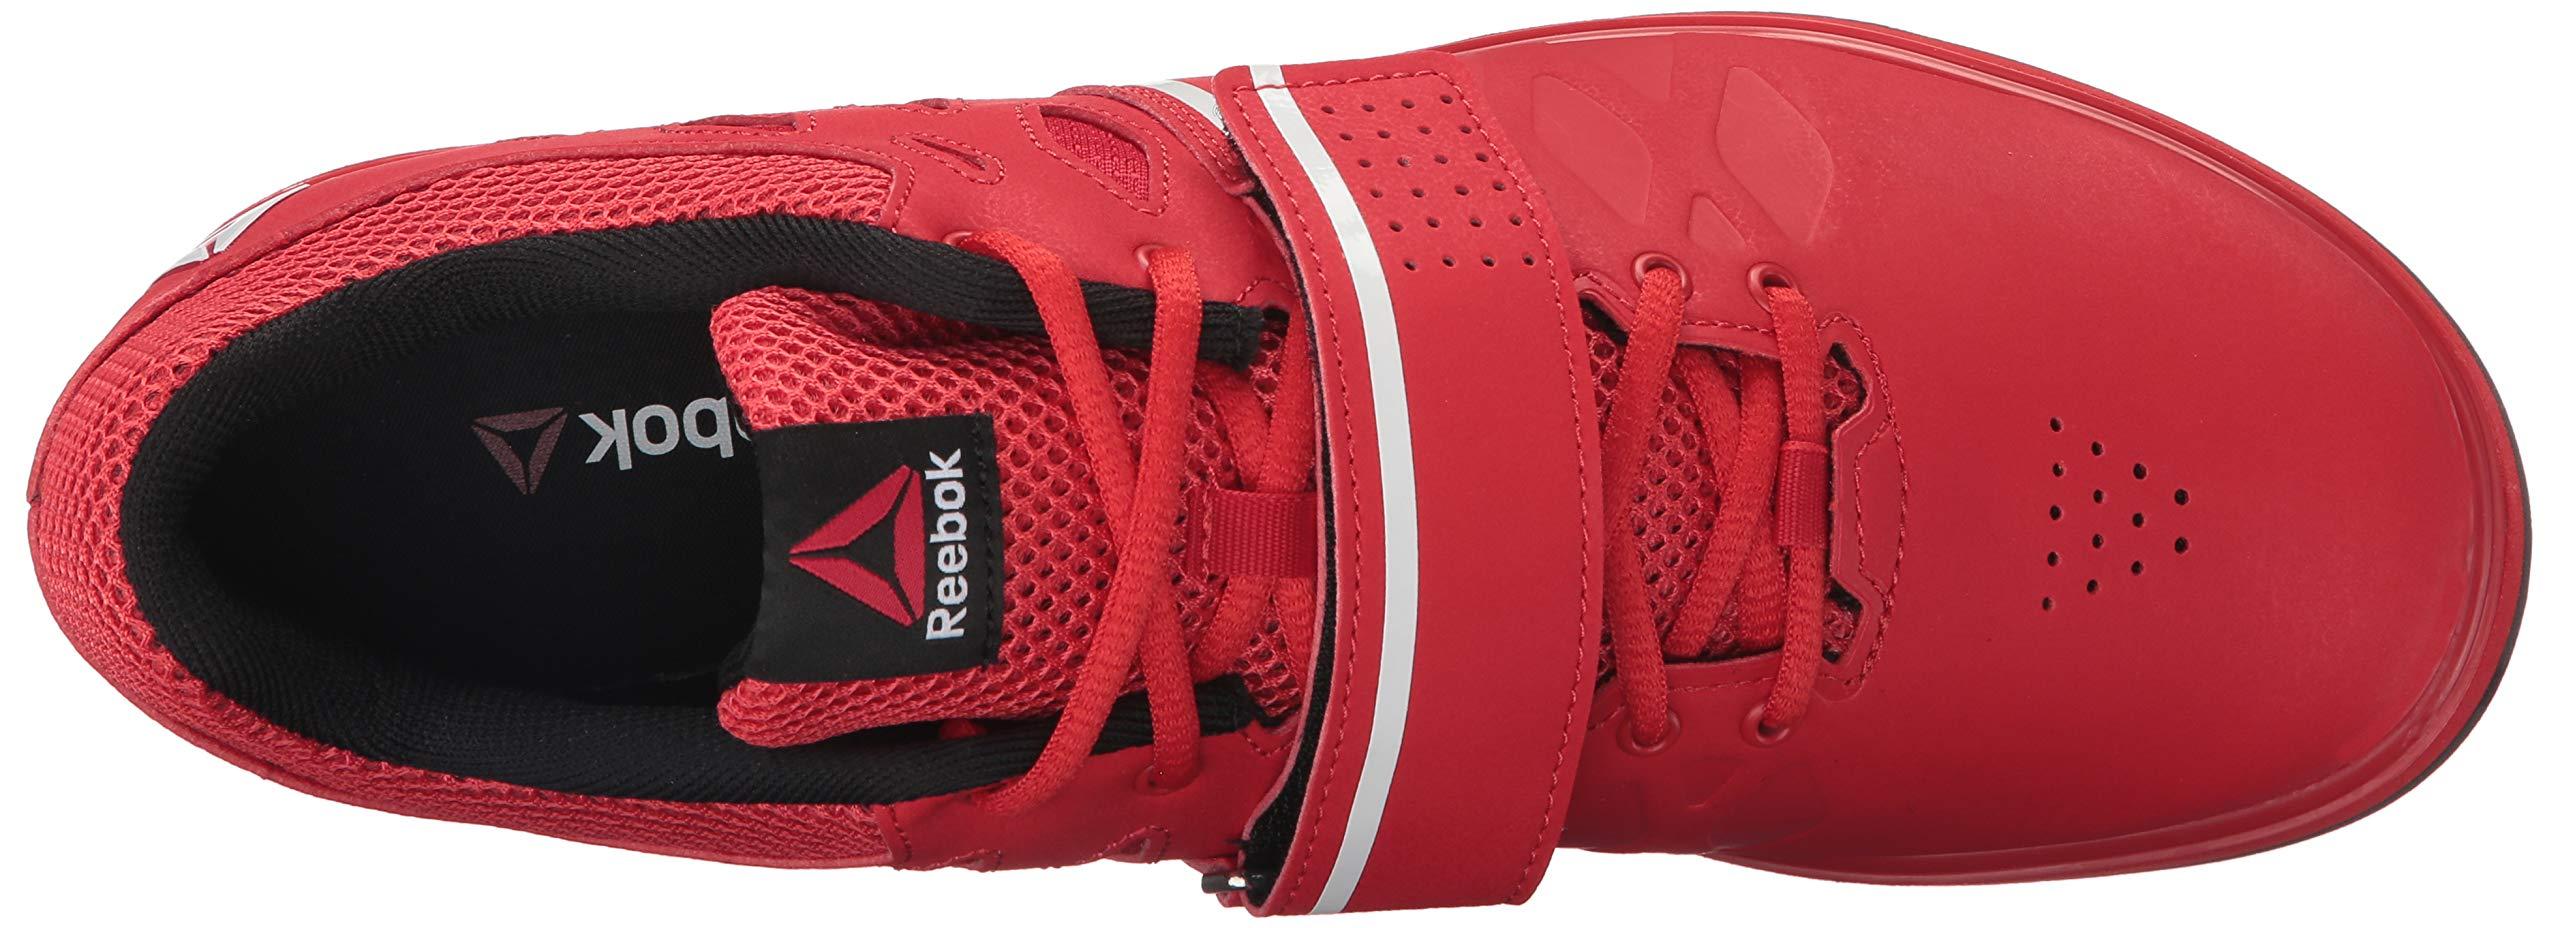 Reebok Men's Lifter Pr Cross-Trainer Shoe, Primal Red/Black/White, 7.5 M US by Reebok (Image #13)